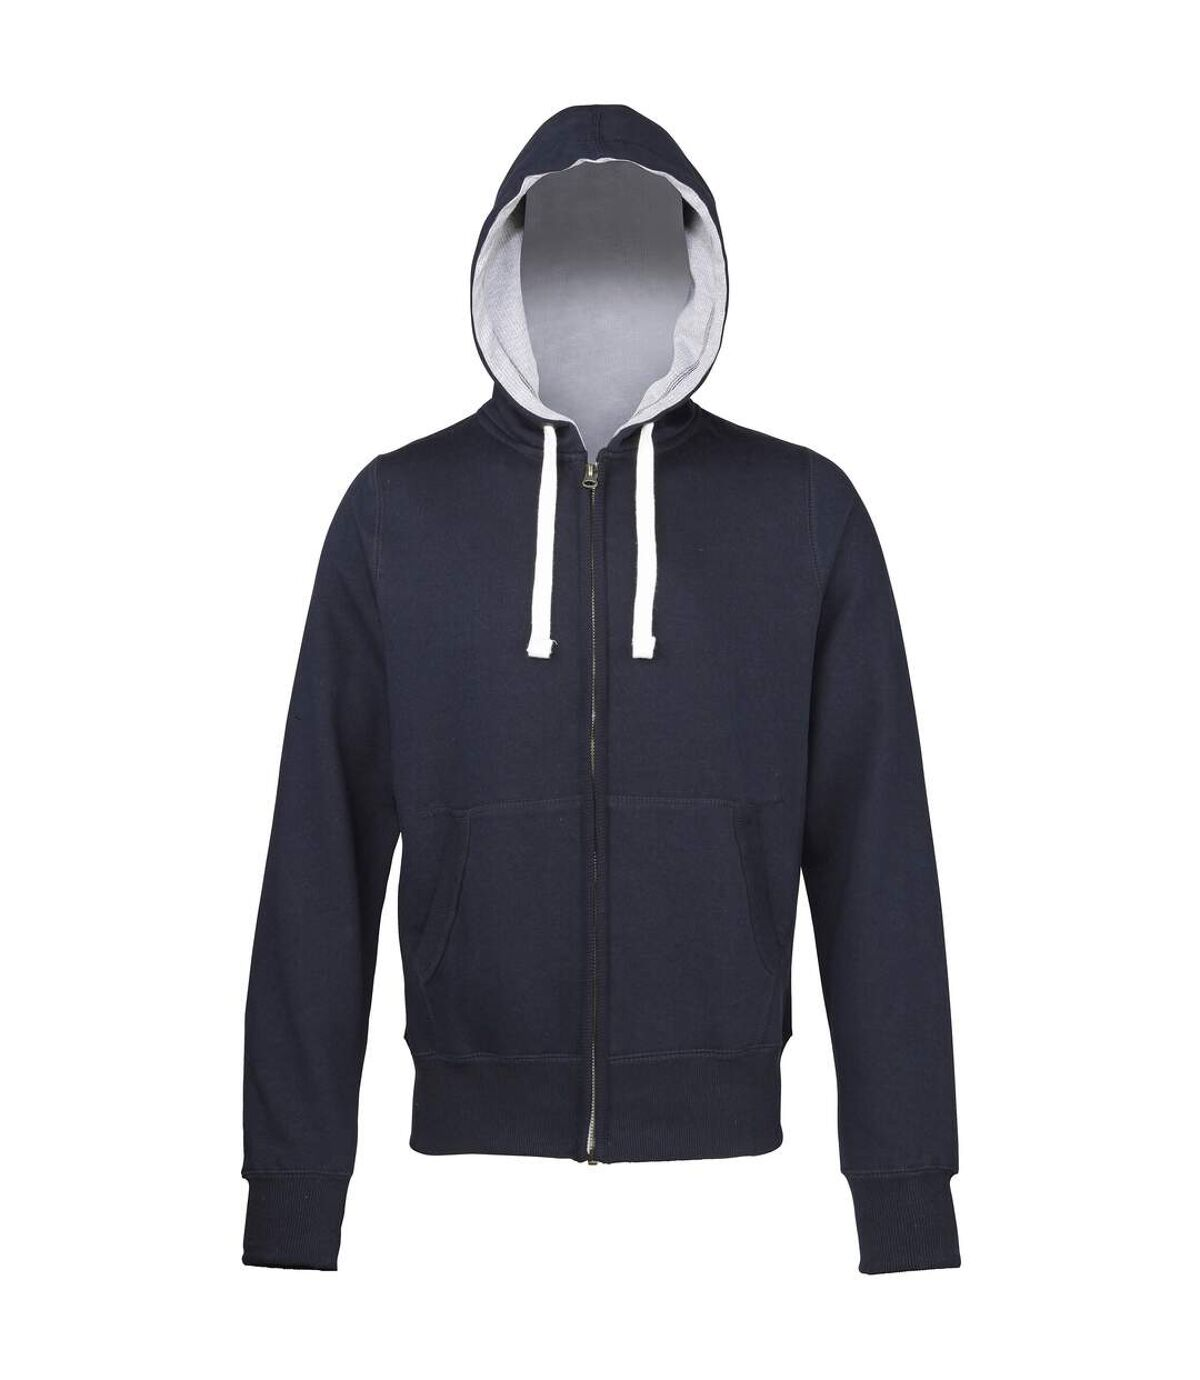 Awdis Chunky Premium Heavyweight Hooded Sweatshirt / Hoodie / Zoodie (Jet Black (Grey inner)) - UTRW181